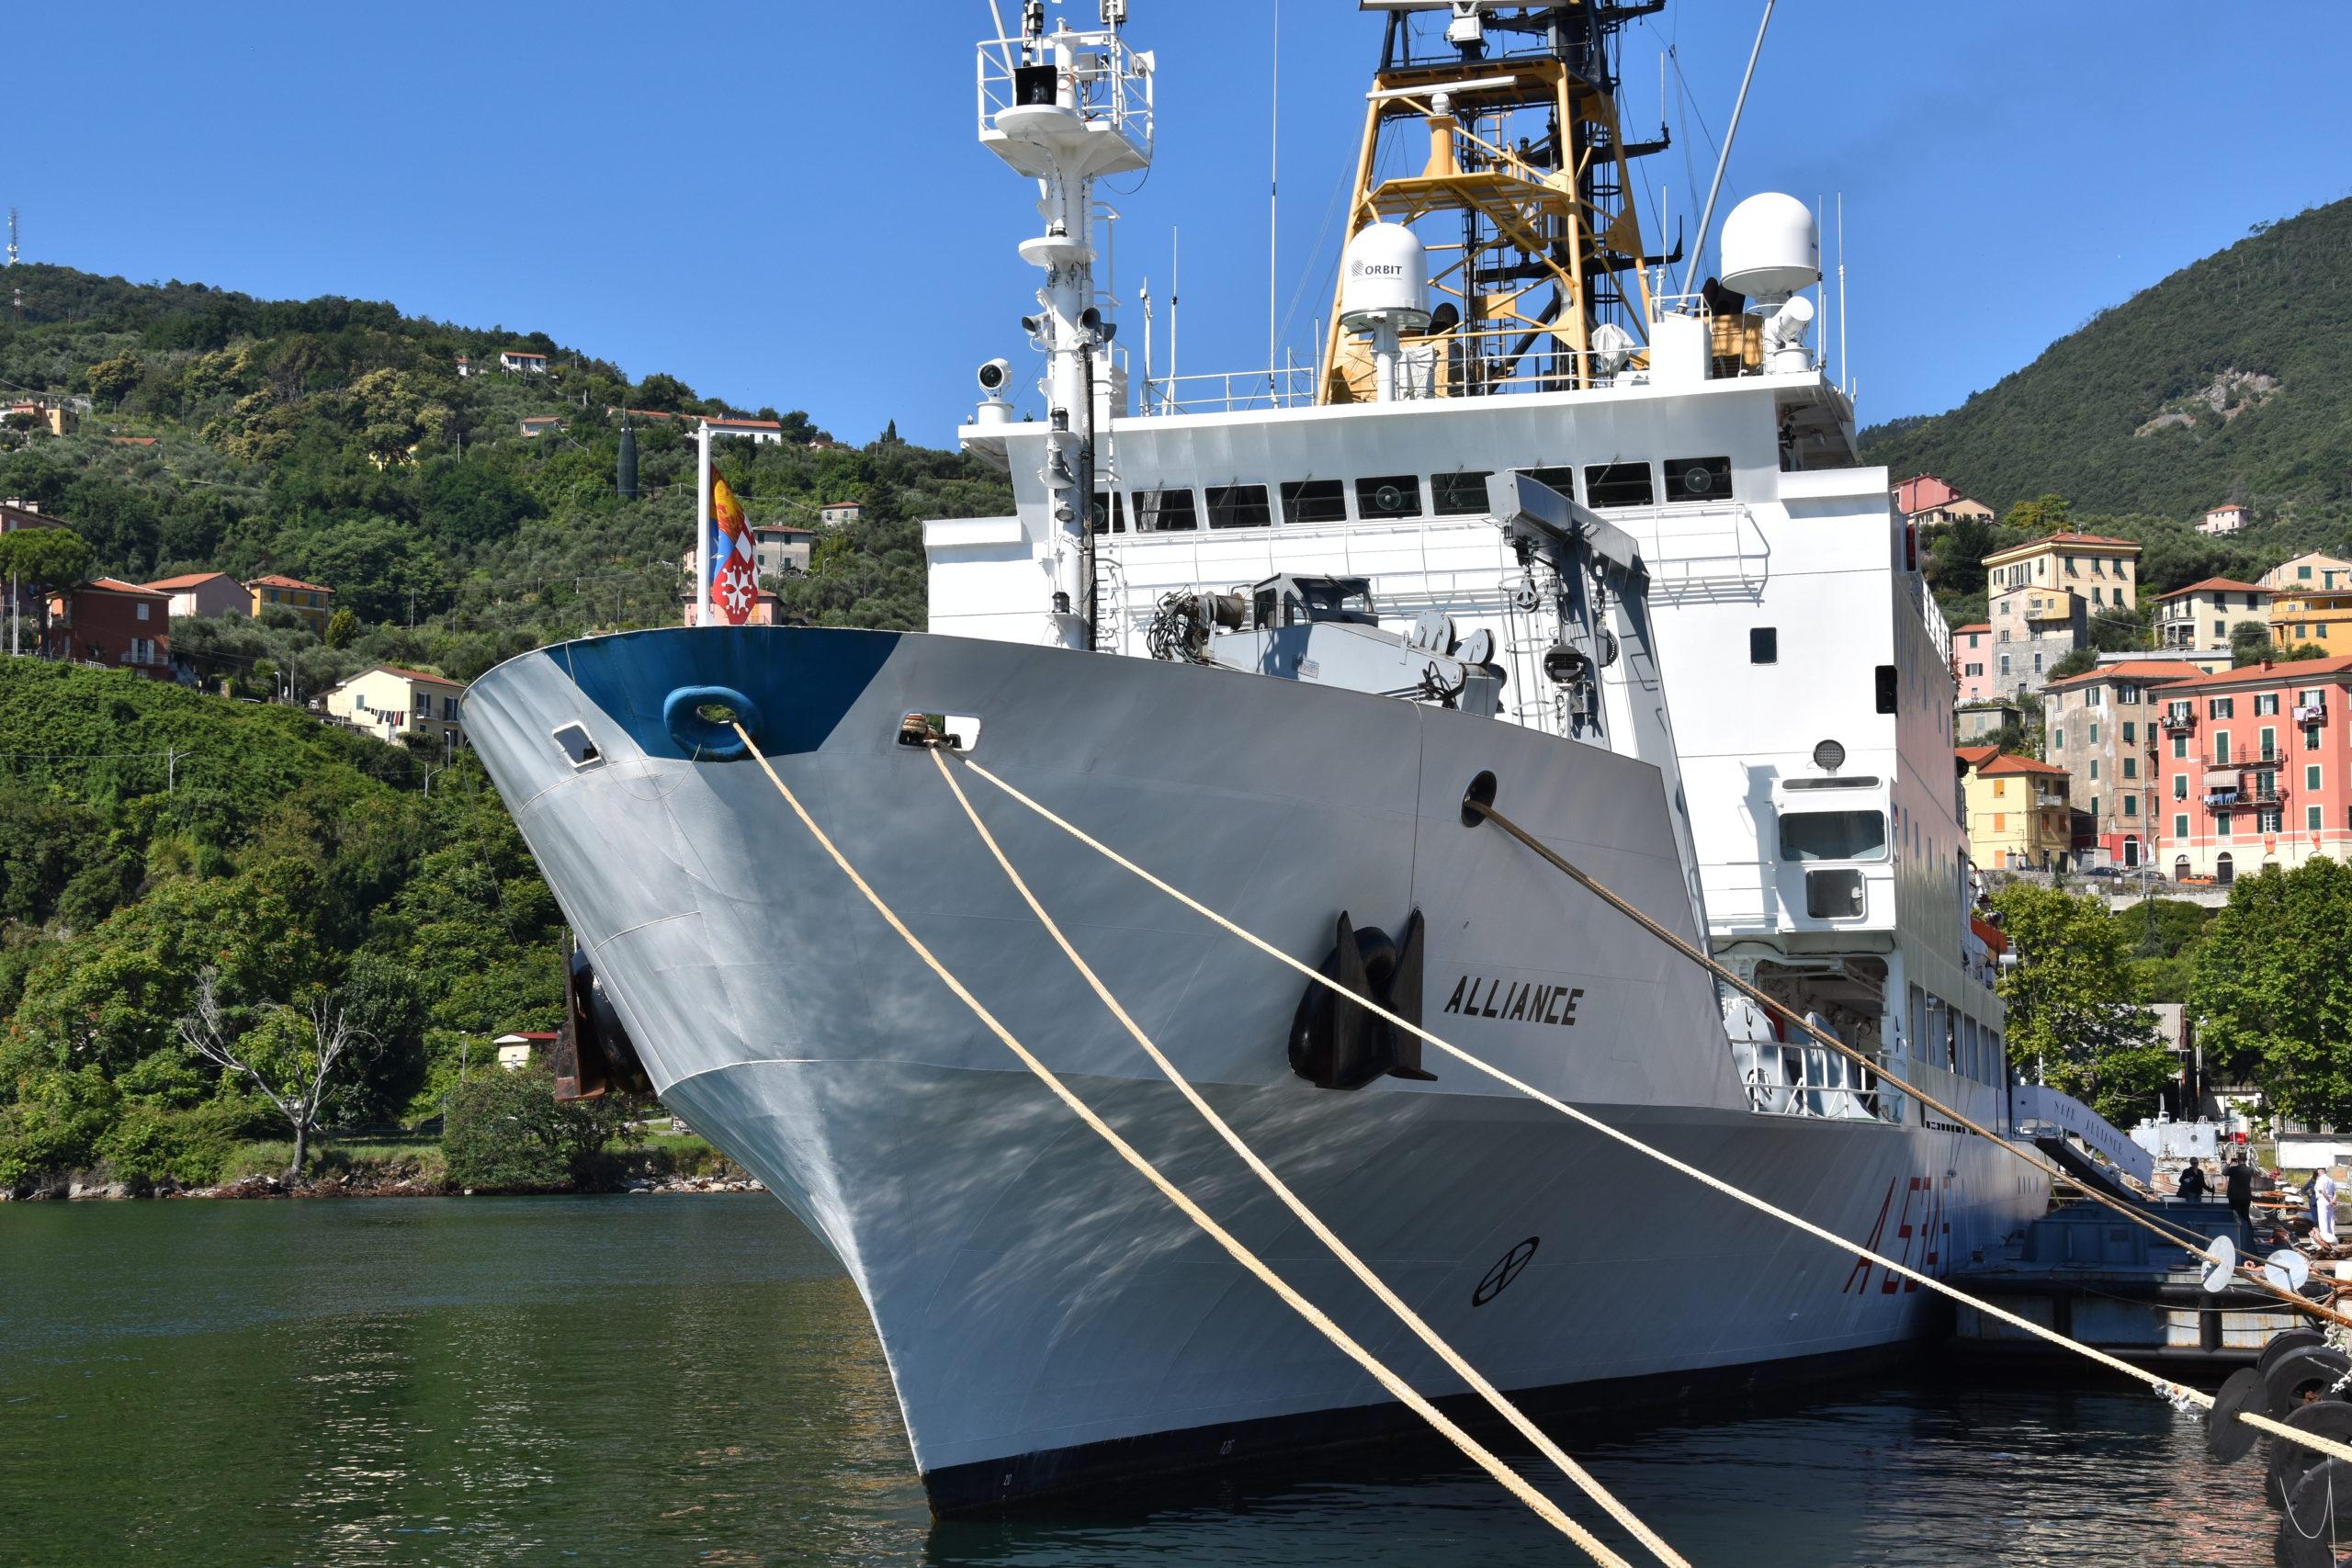 nave alliance italia